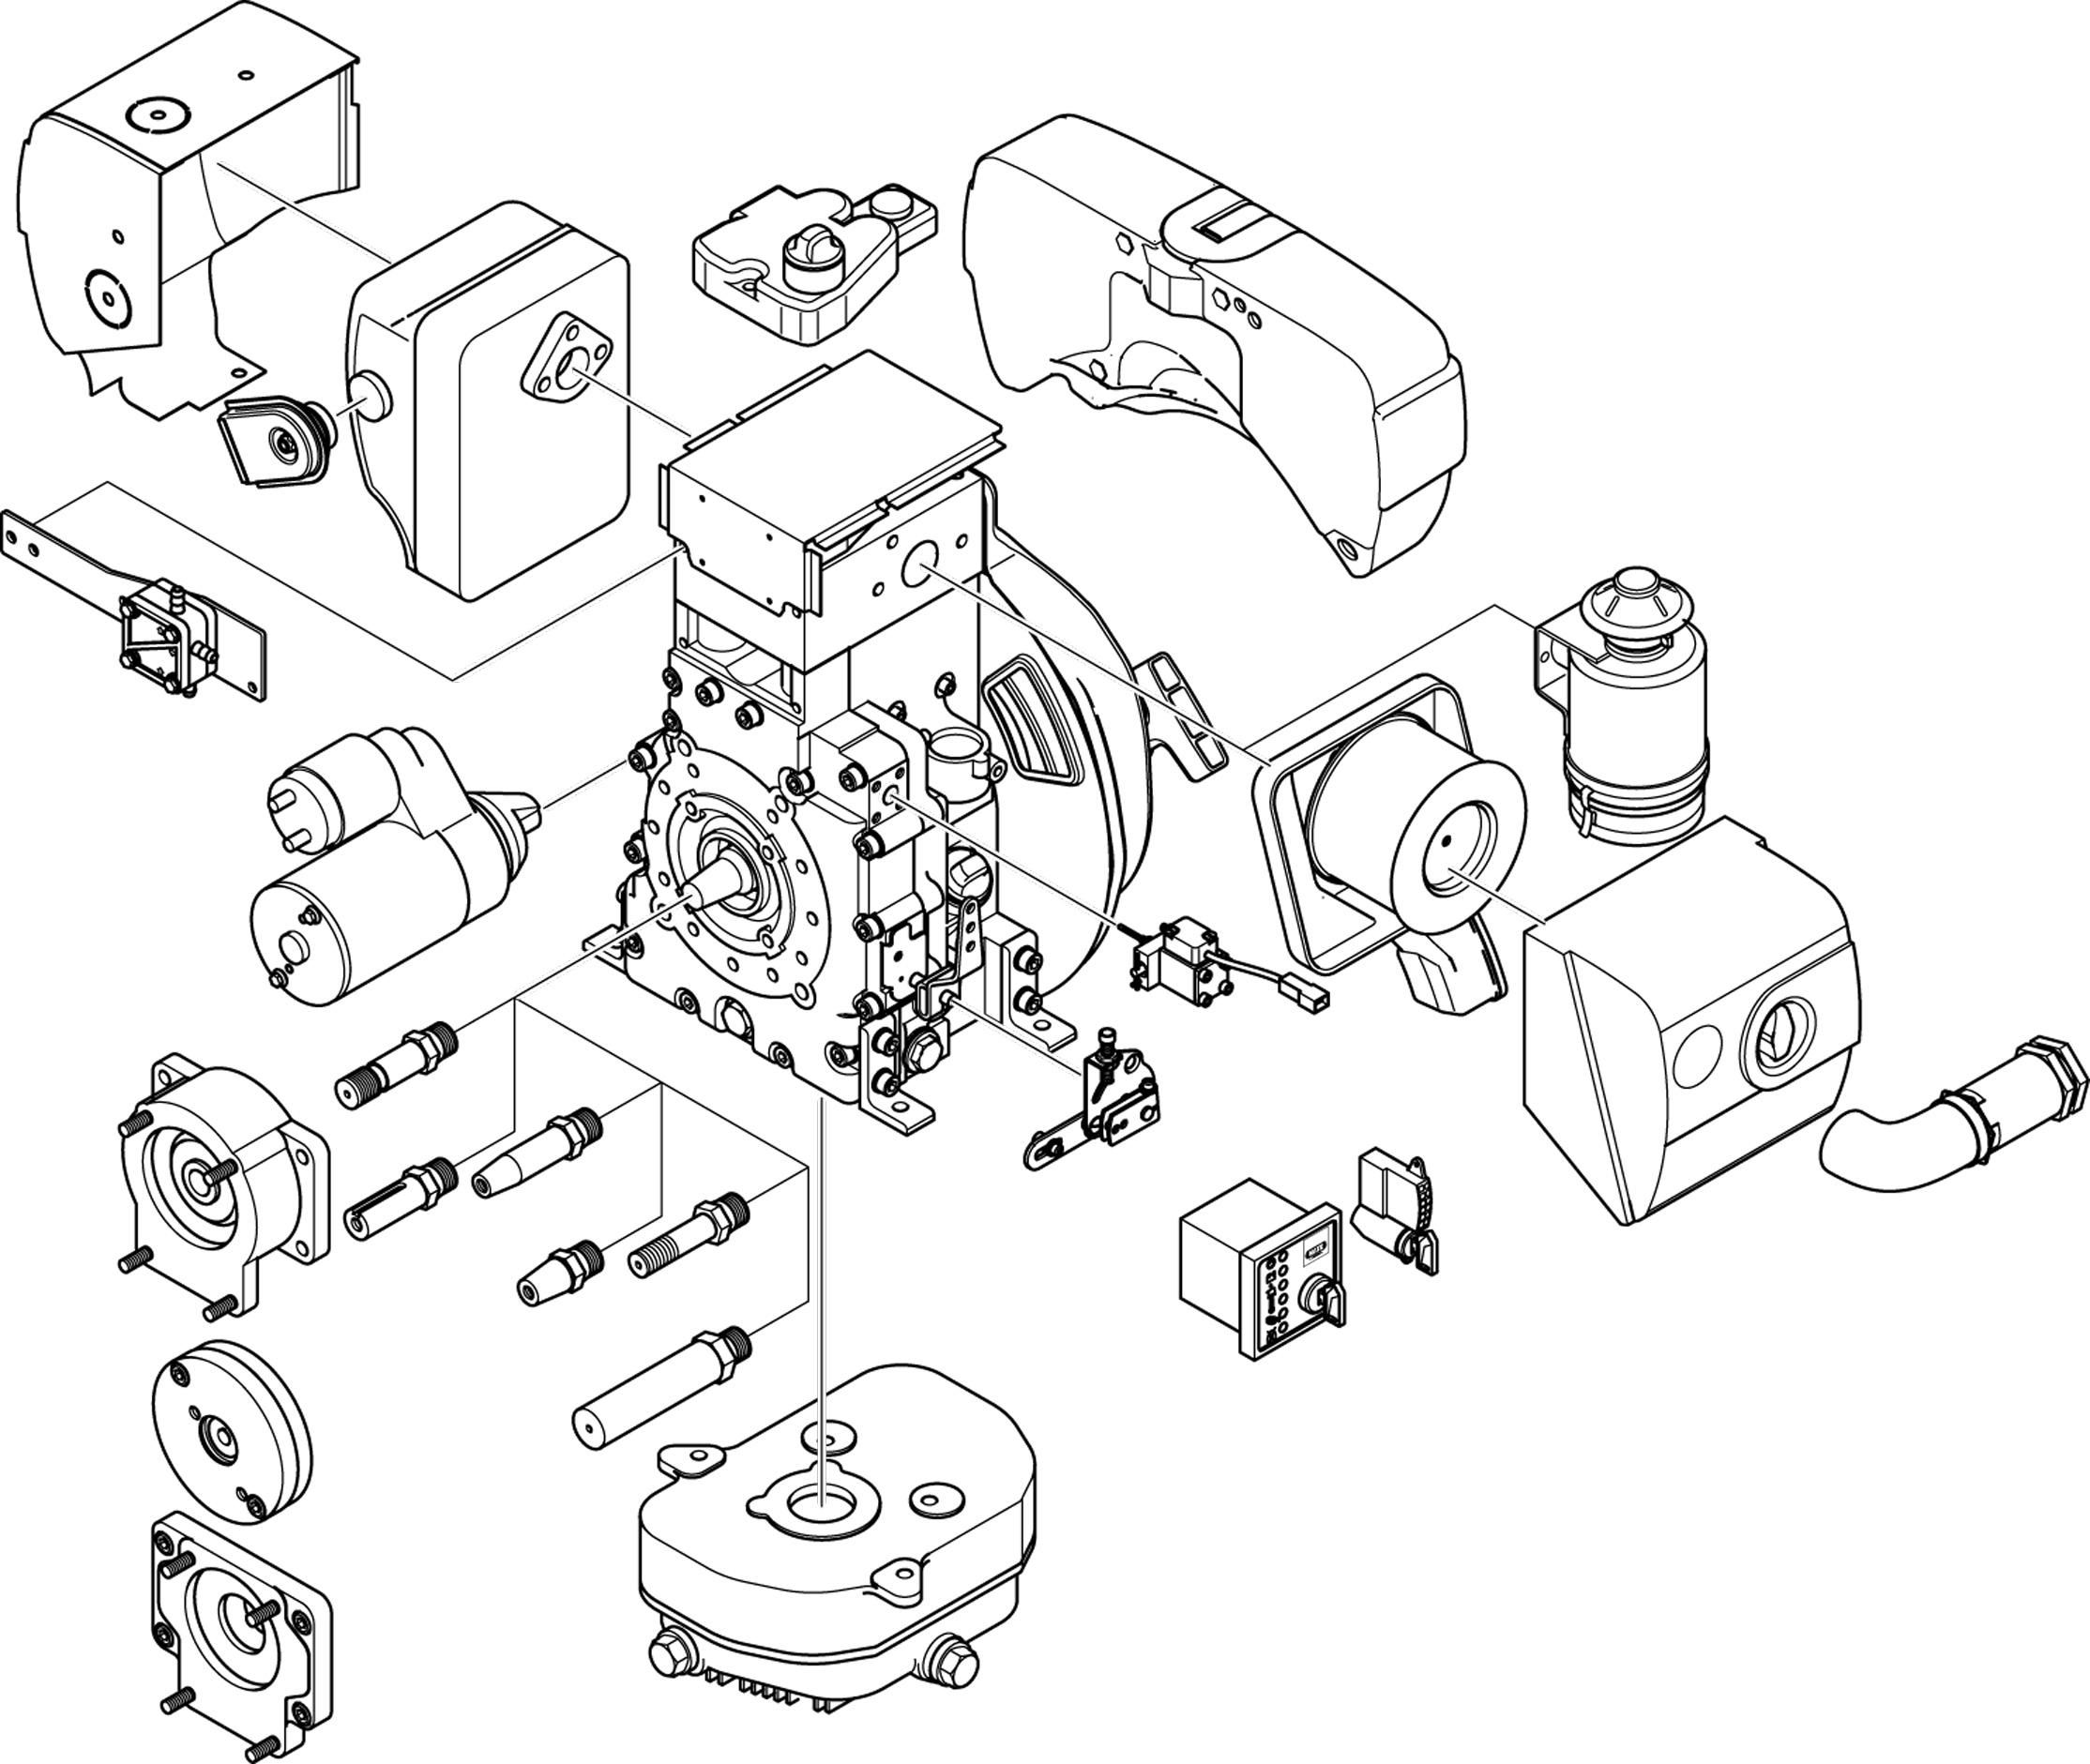 2003 dodge ram 2500 trailer wiring diagram simple diagrams long bed database b series small diesel engine single cylinder hatz cab